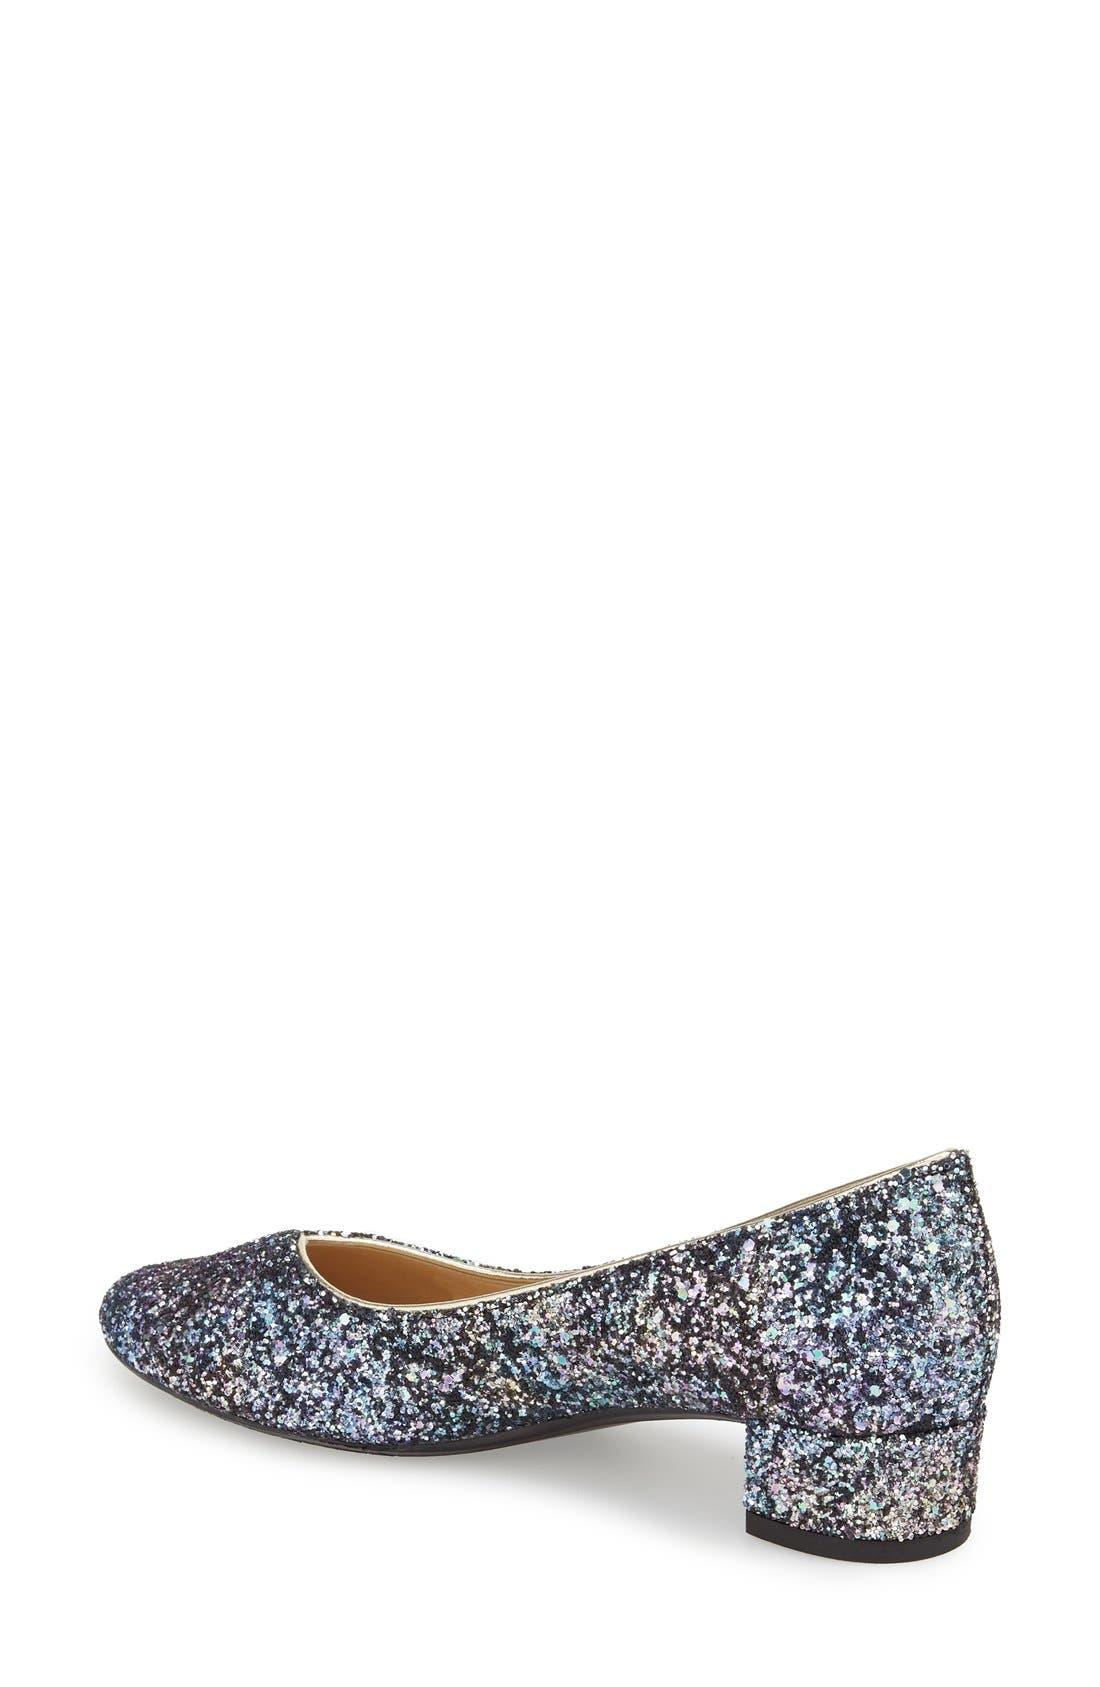 'Bambalina' Block Heel Glitter Pump,                             Alternate thumbnail 2, color,                             Blue/ Gold Glitter Fabric